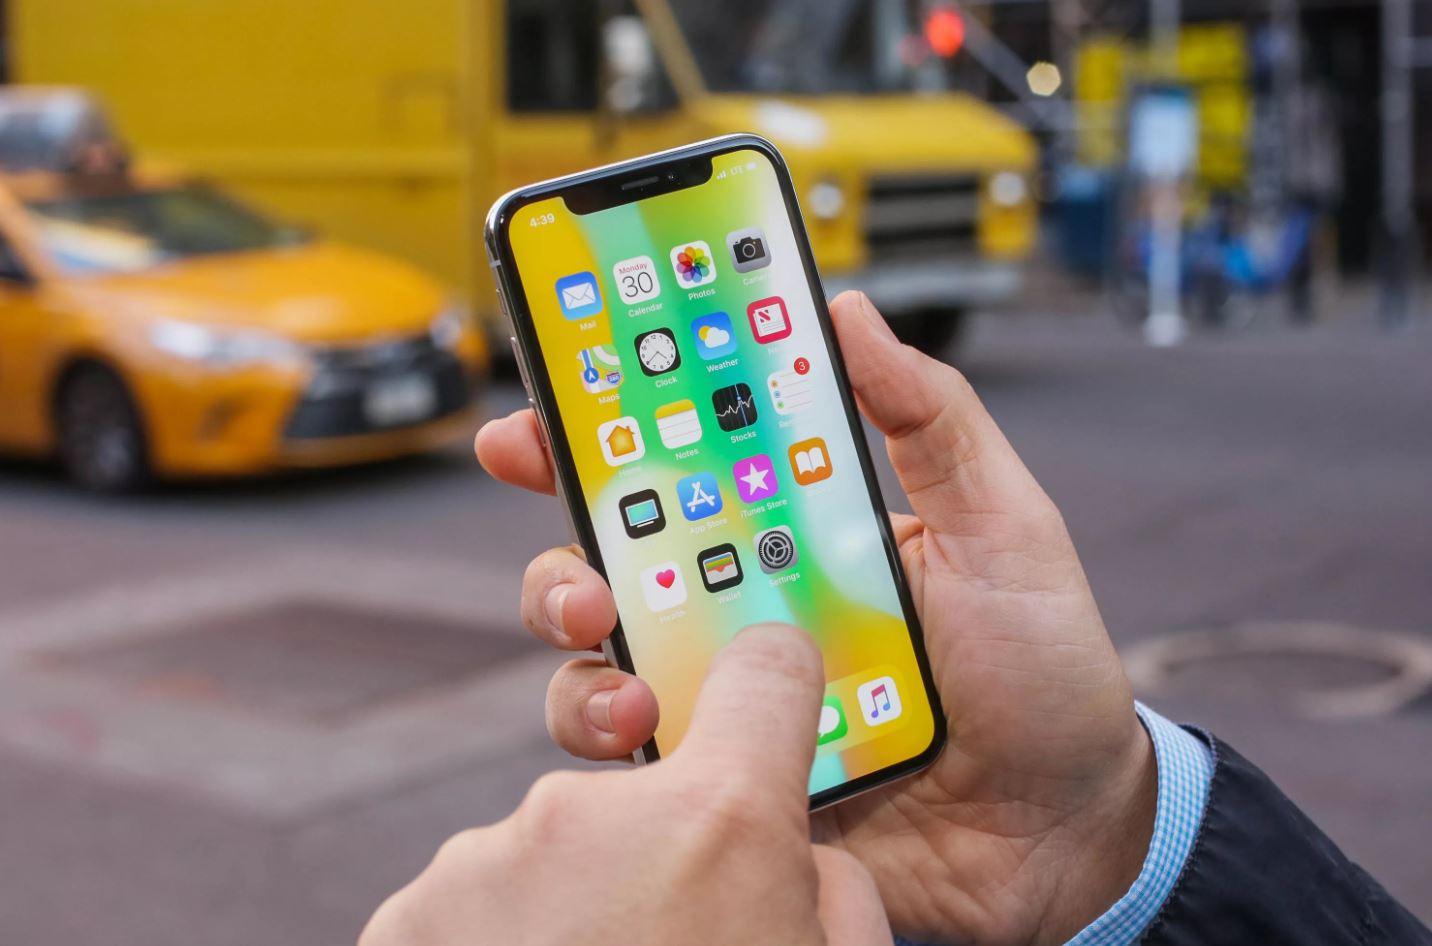 återställer iPhone 7, 8, X och Xs